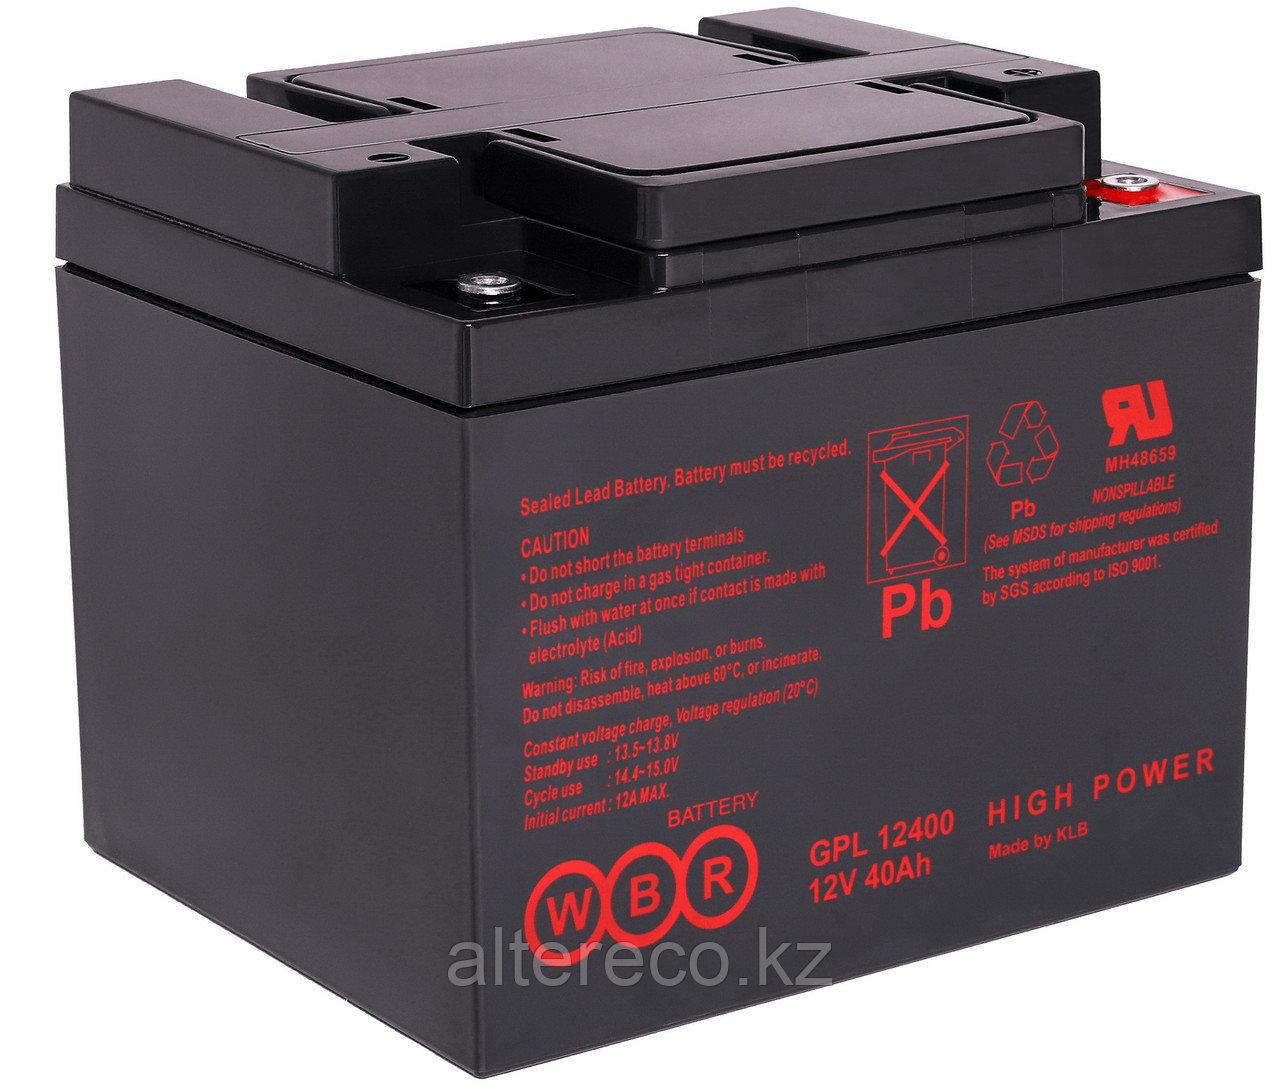 Аккумулятор WBR GPL 12400 (12В, 40Ач)